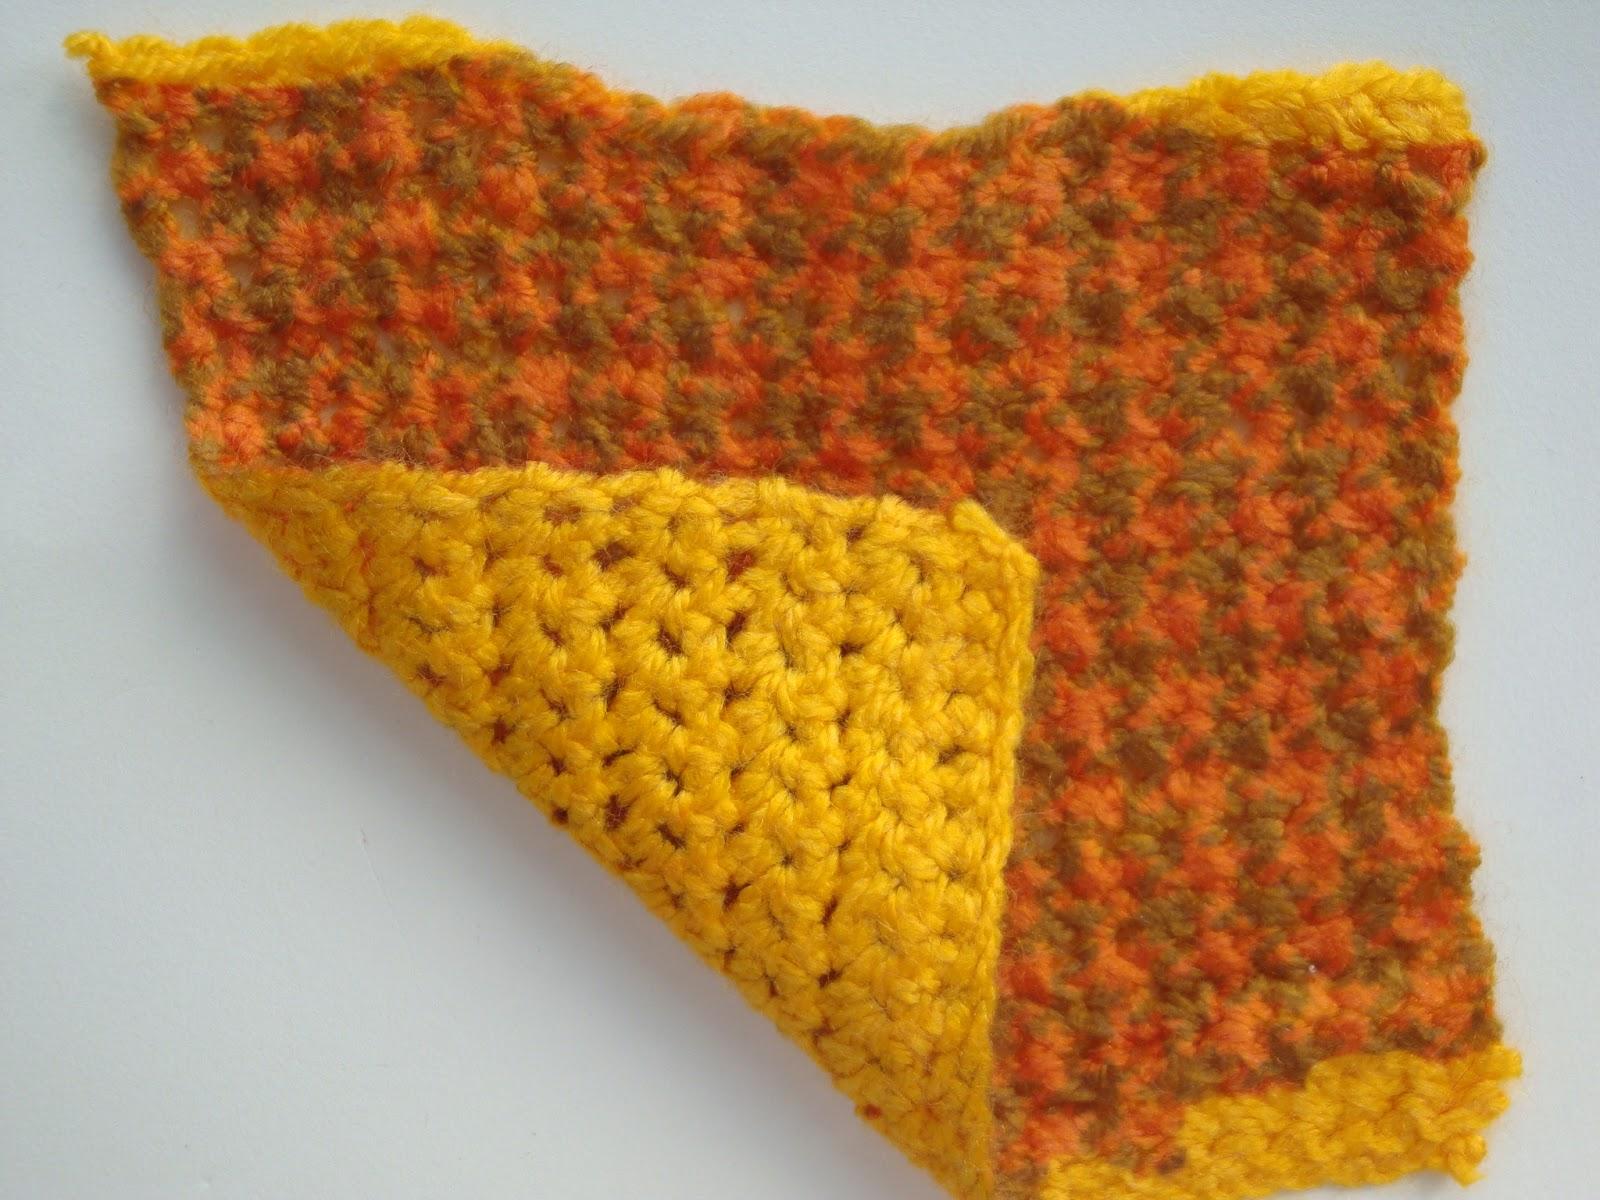 Crochet HoundsTOOTH for Fall | Morgan Bajardi. Textile Design. New York.